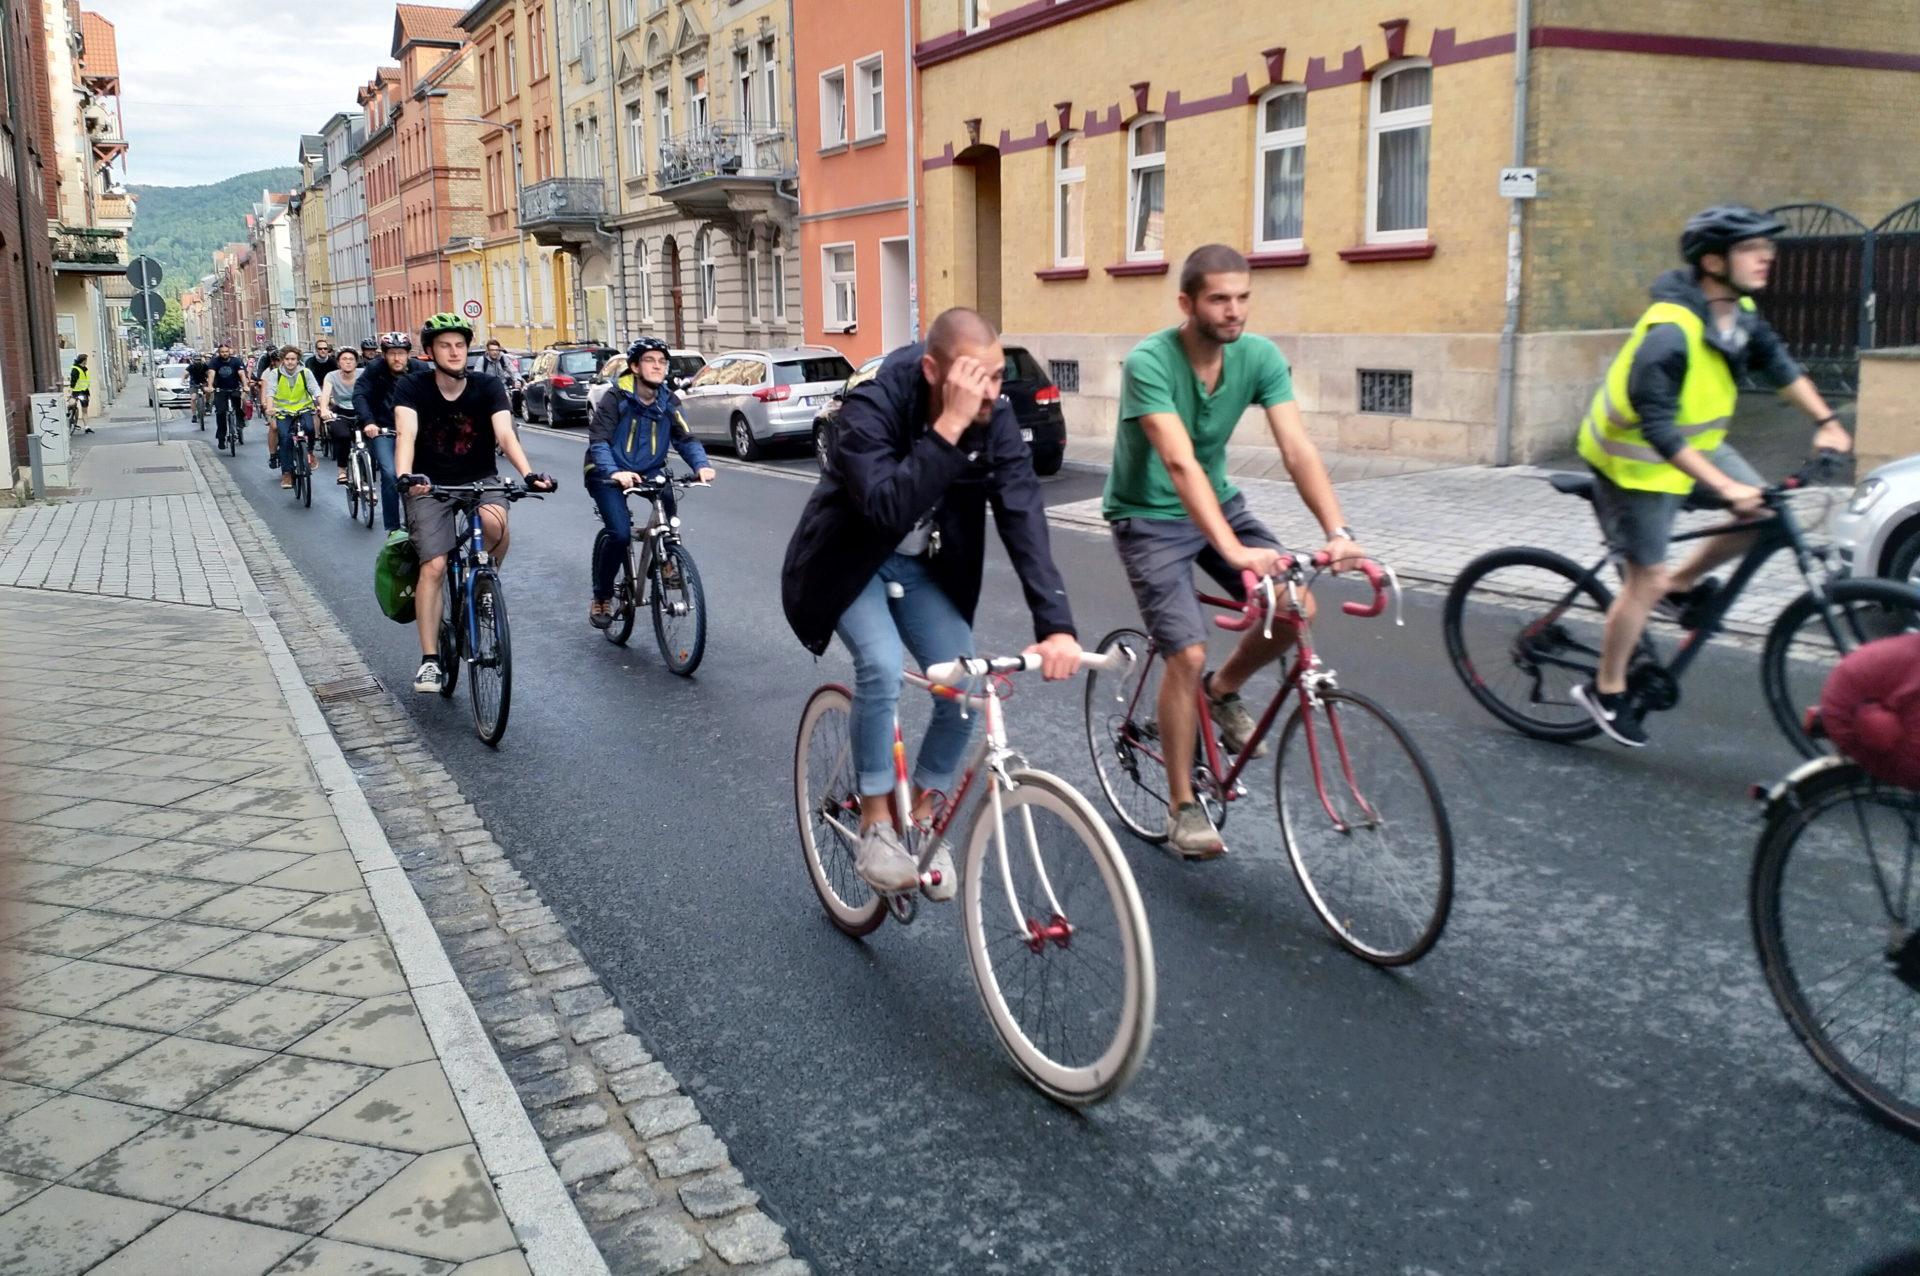 Fahrraddemo: Für Fahrradstraßen im Jenaer West-Kiez